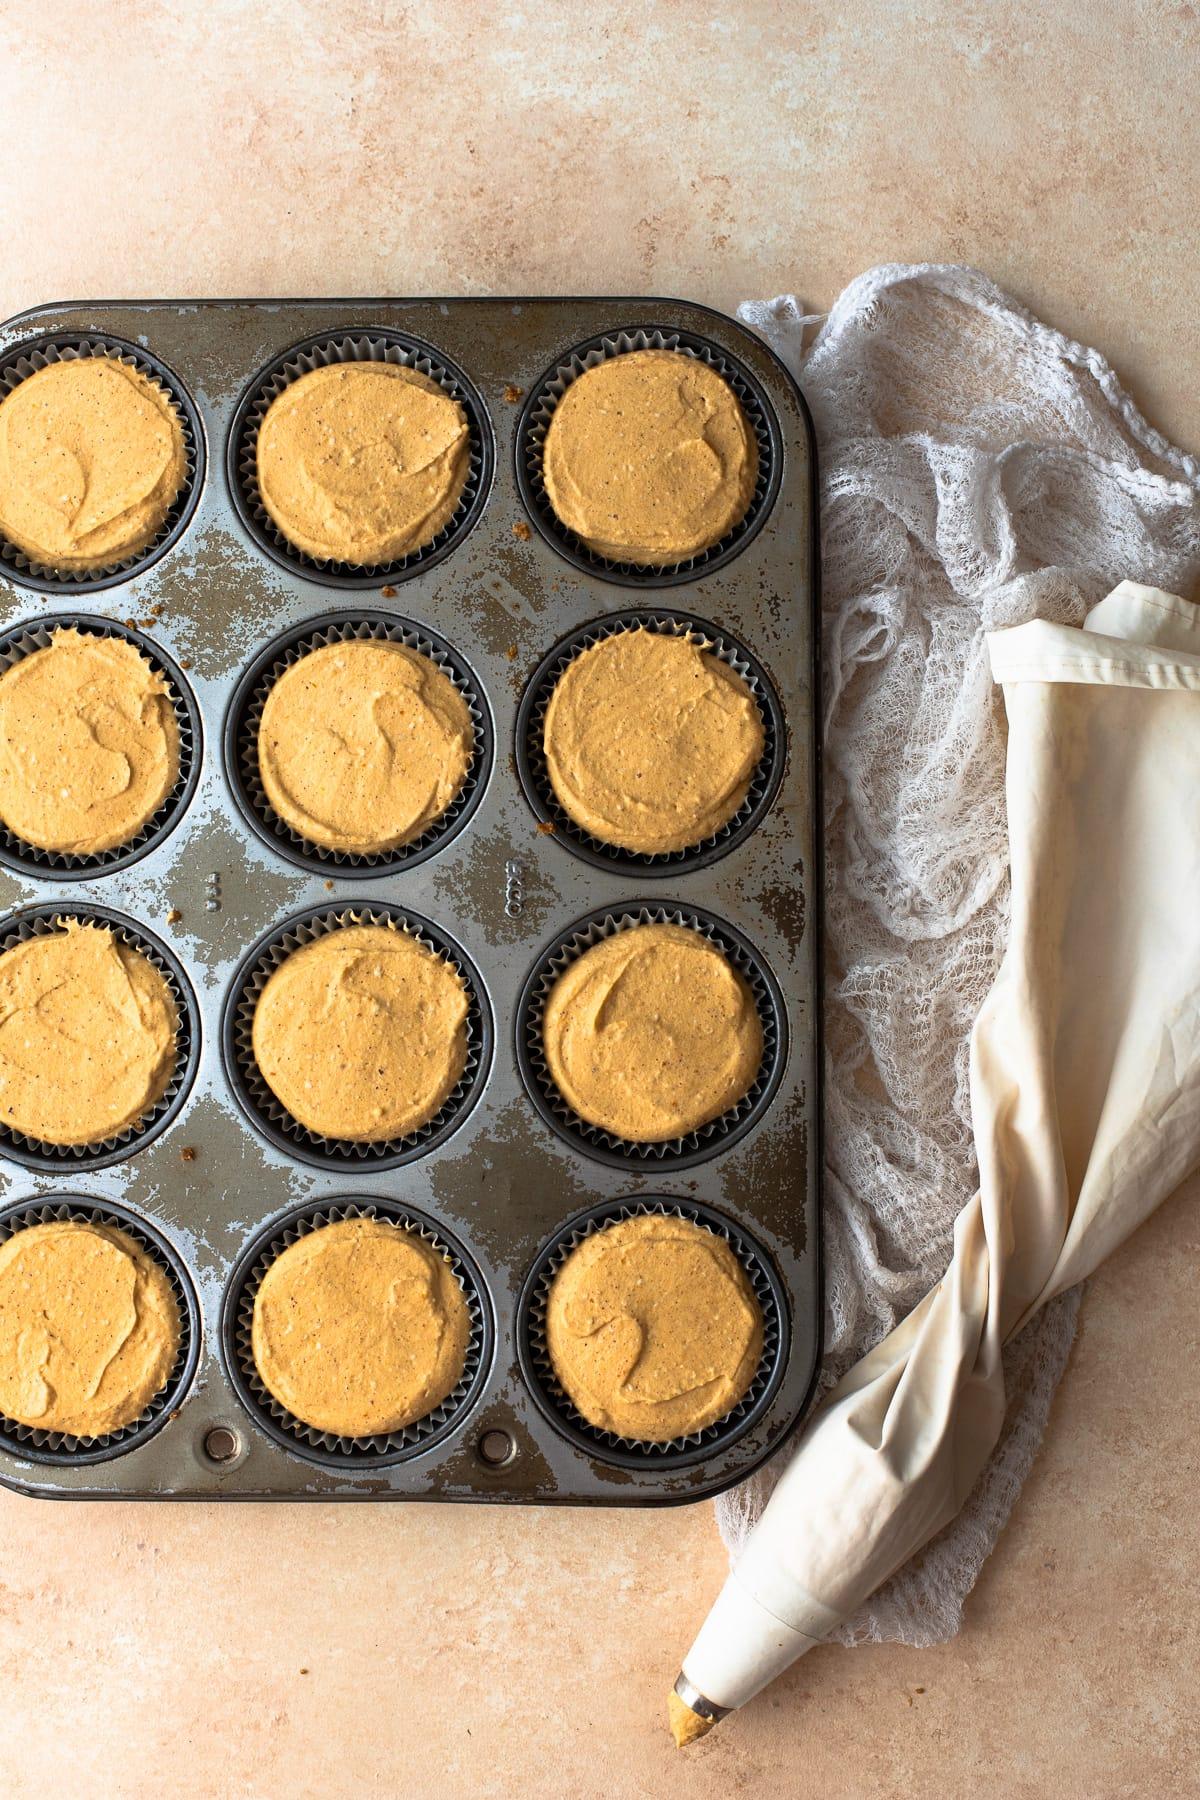 Mini pumpkin cheesecakes assembled in a muffin pan.